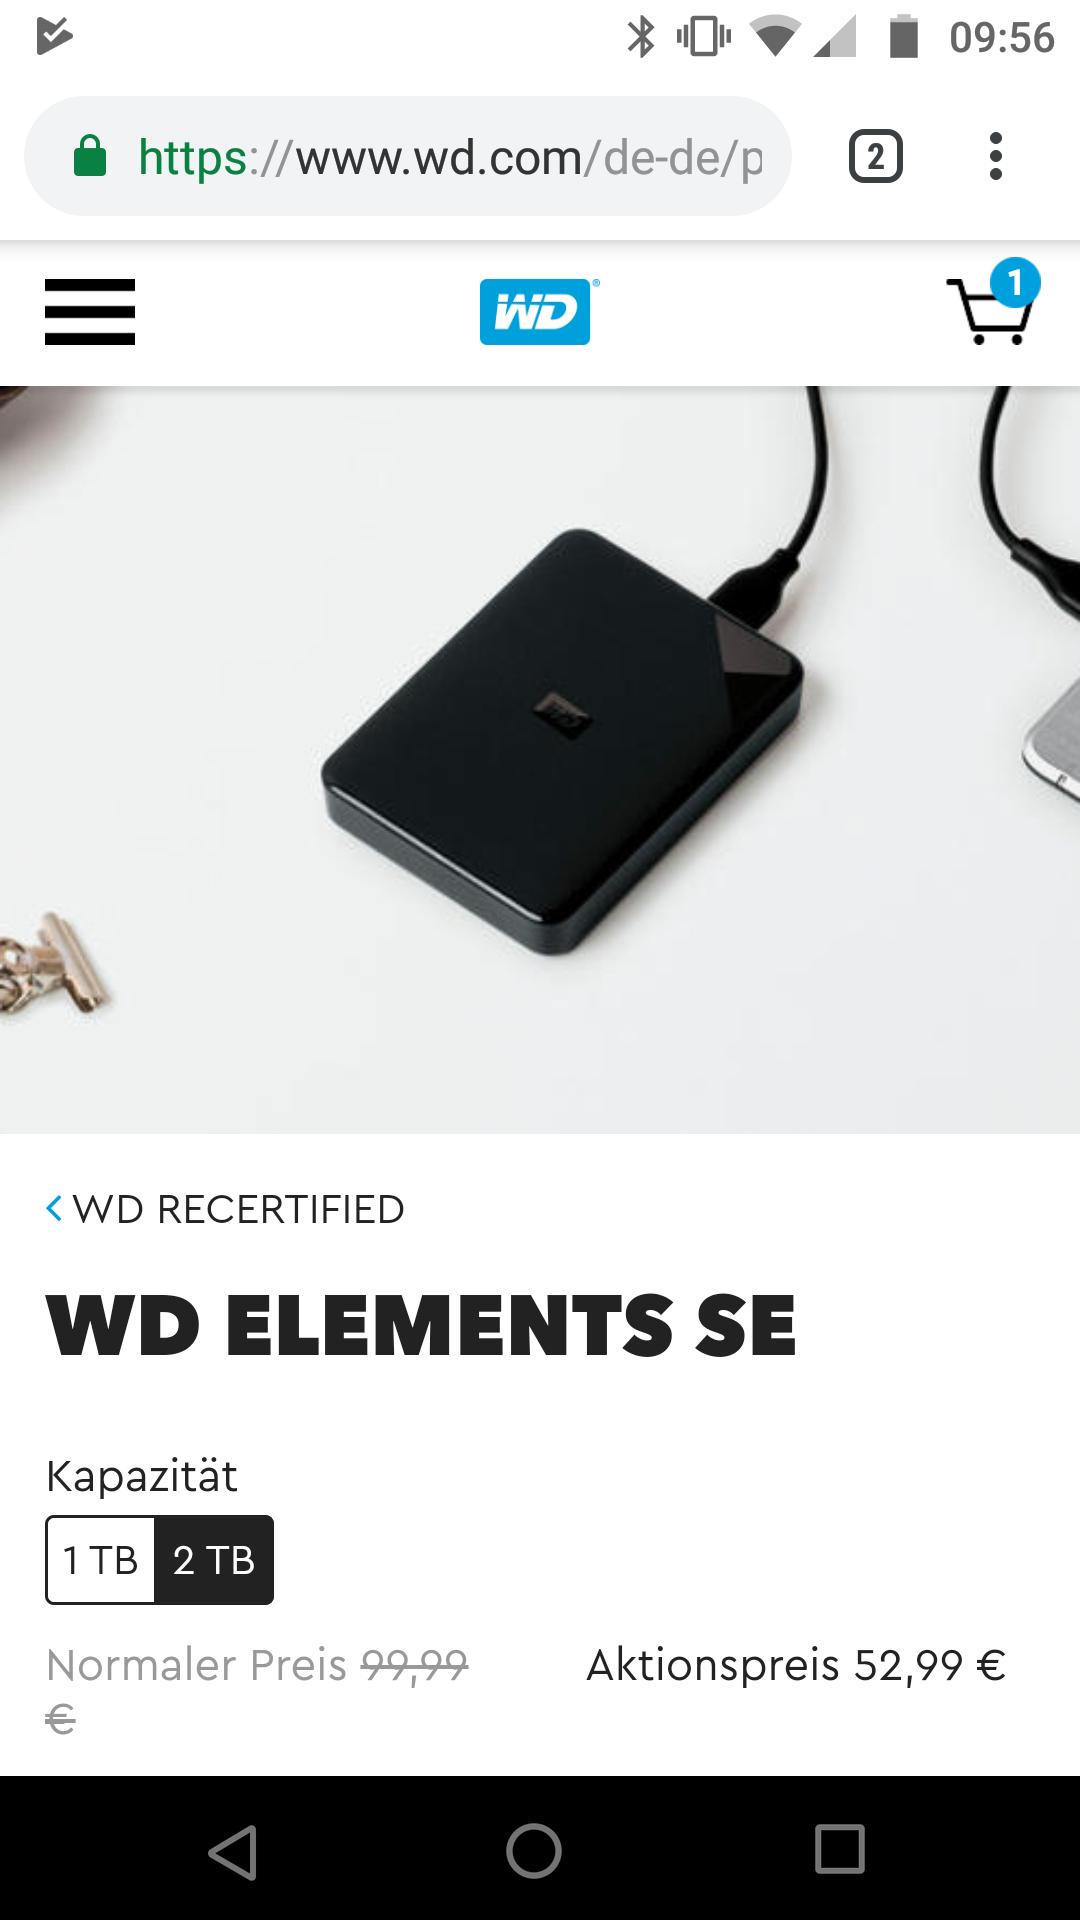 WD Elements SE 2TB Western Digital Recertified + 12% Shoop externe Festplatte